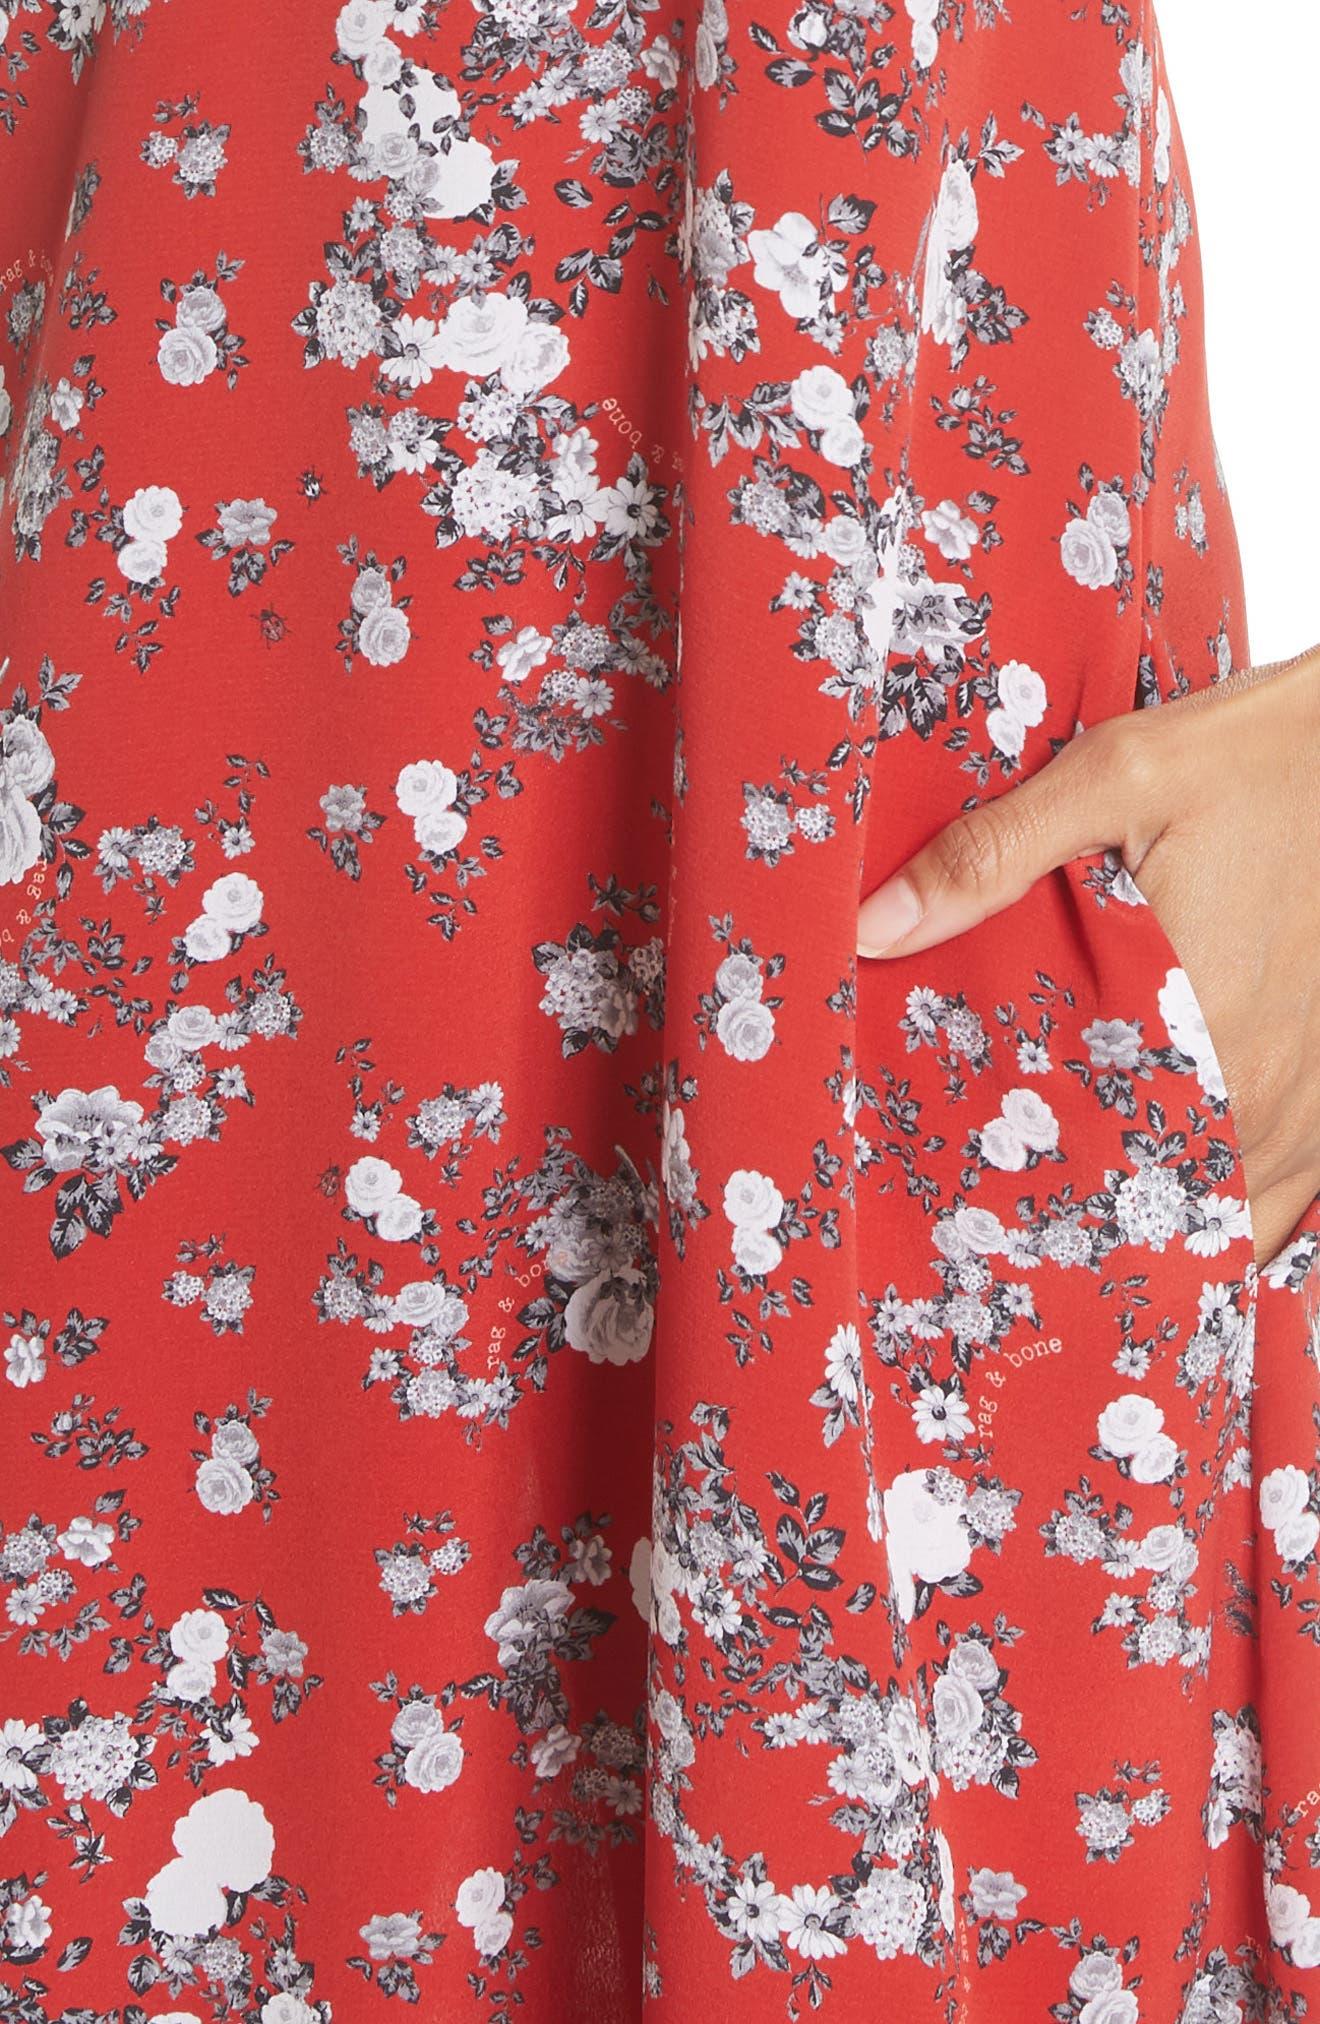 Zoe Floral Print Silk Dress,                             Alternate thumbnail 4, color,                             RED GARDEN FLORAL